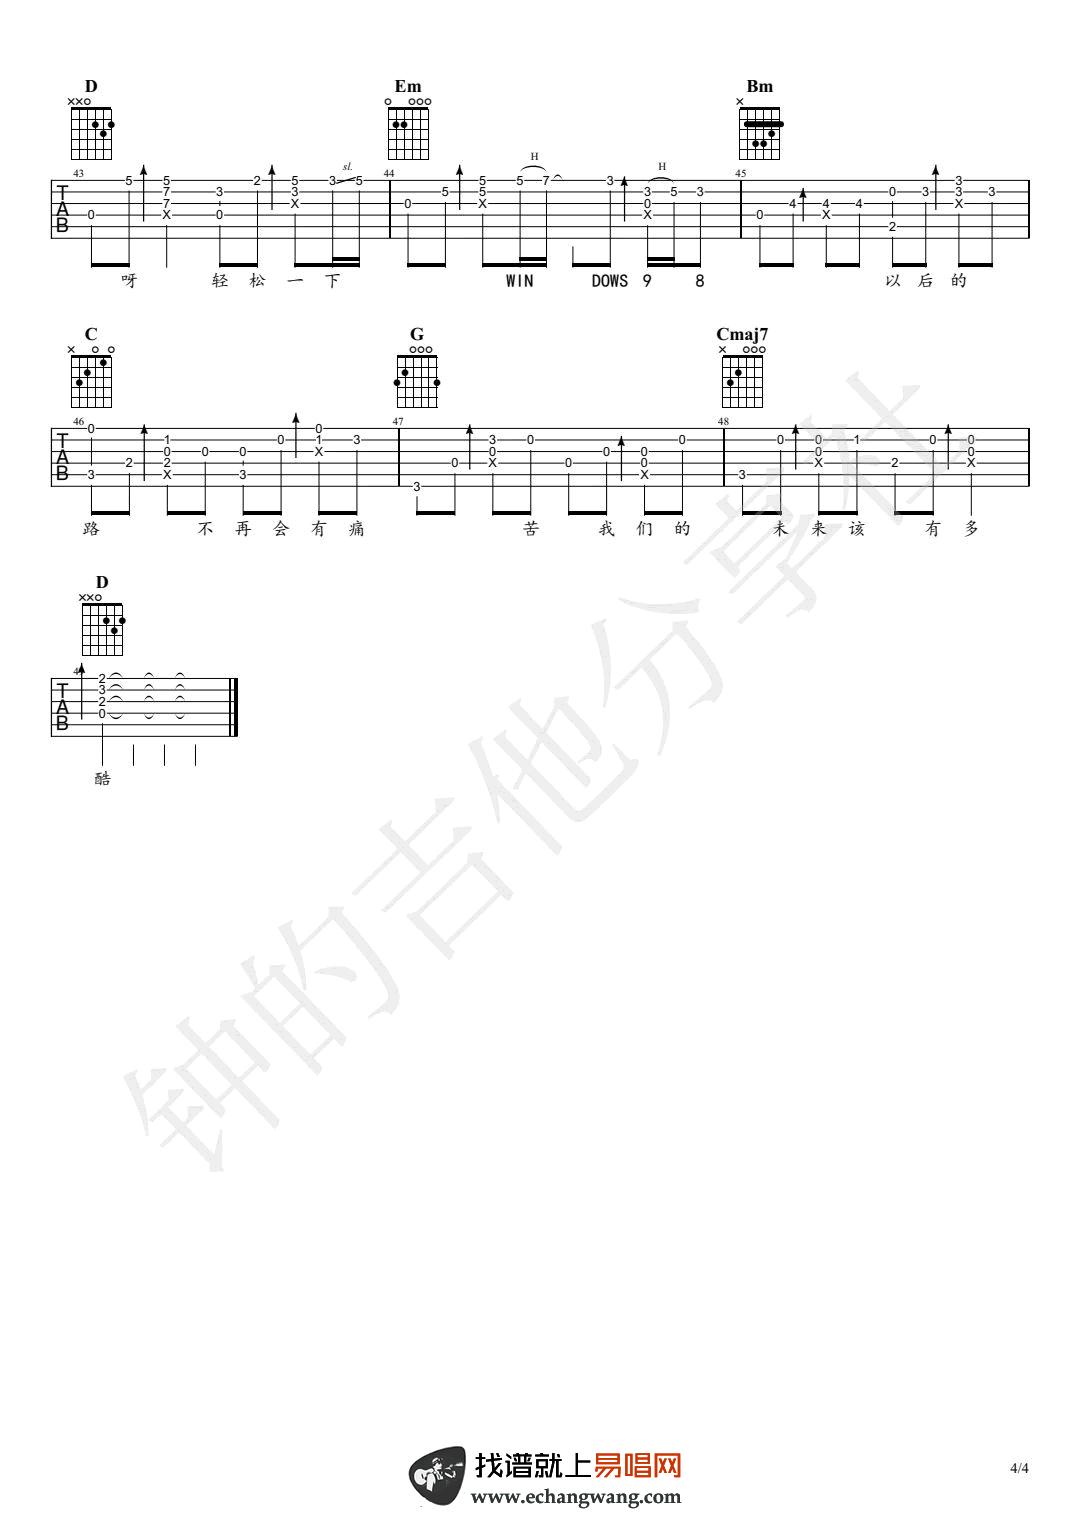 New Boy指弹谱吉他谱 图4